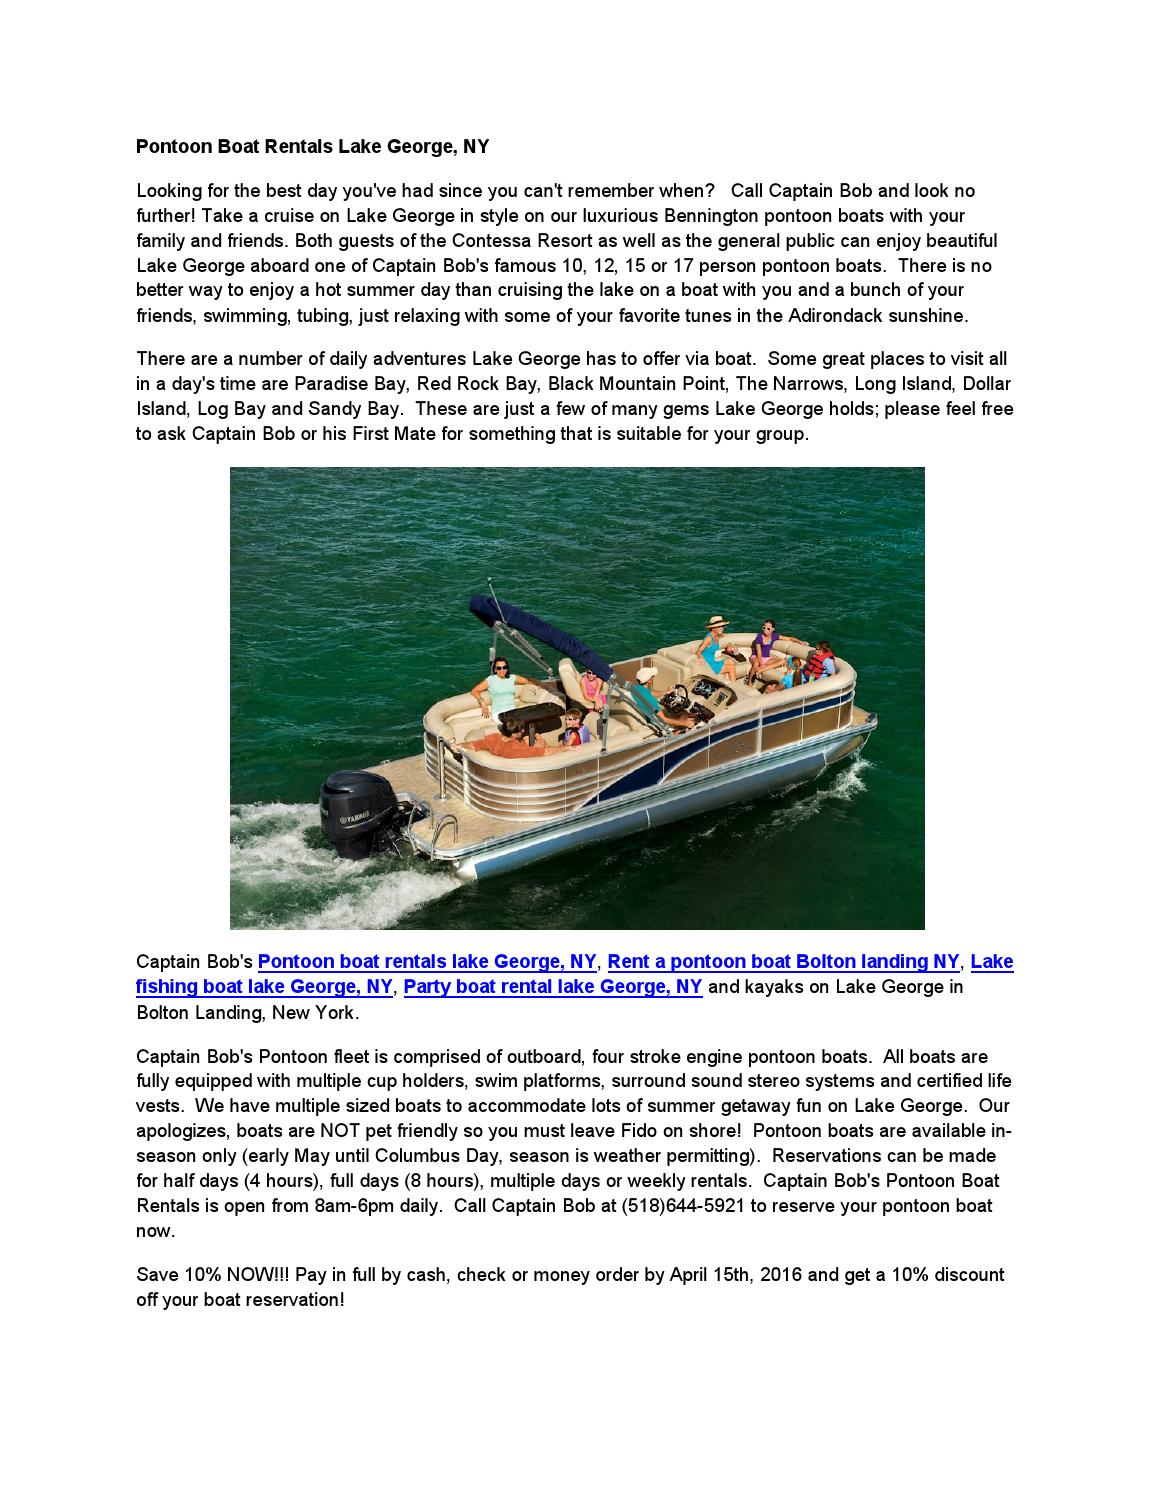 Pontoon boat rentals lake george, ny by Pontoon boat rental